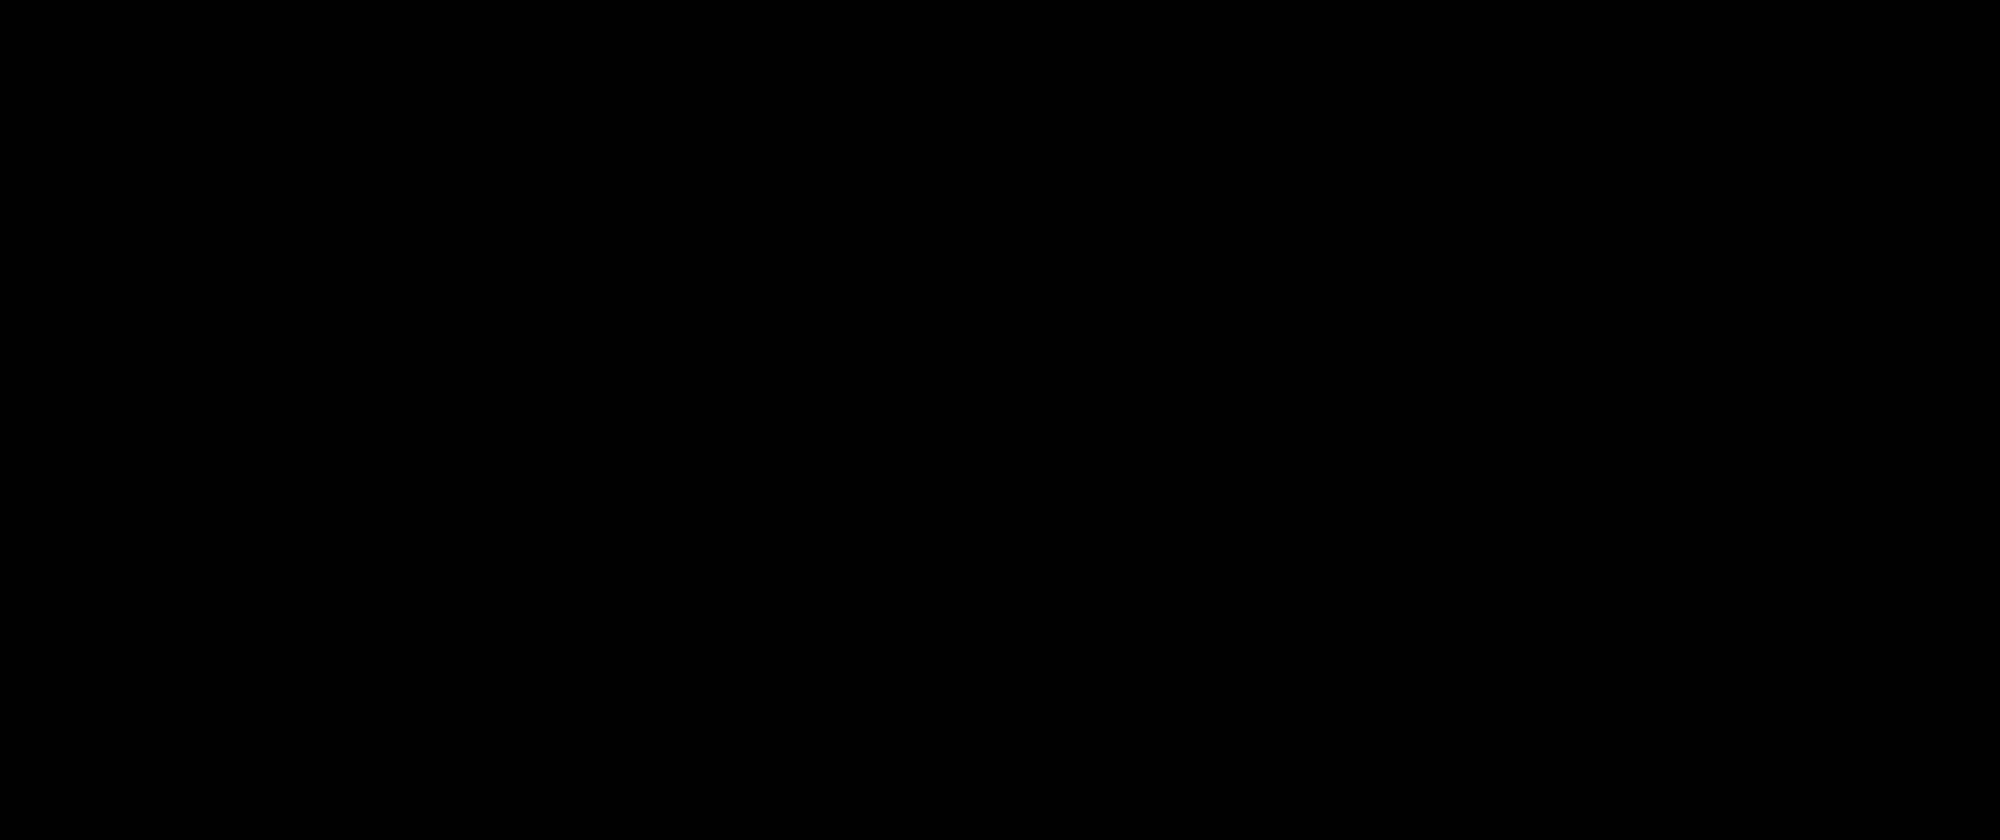 ps3-logo-png